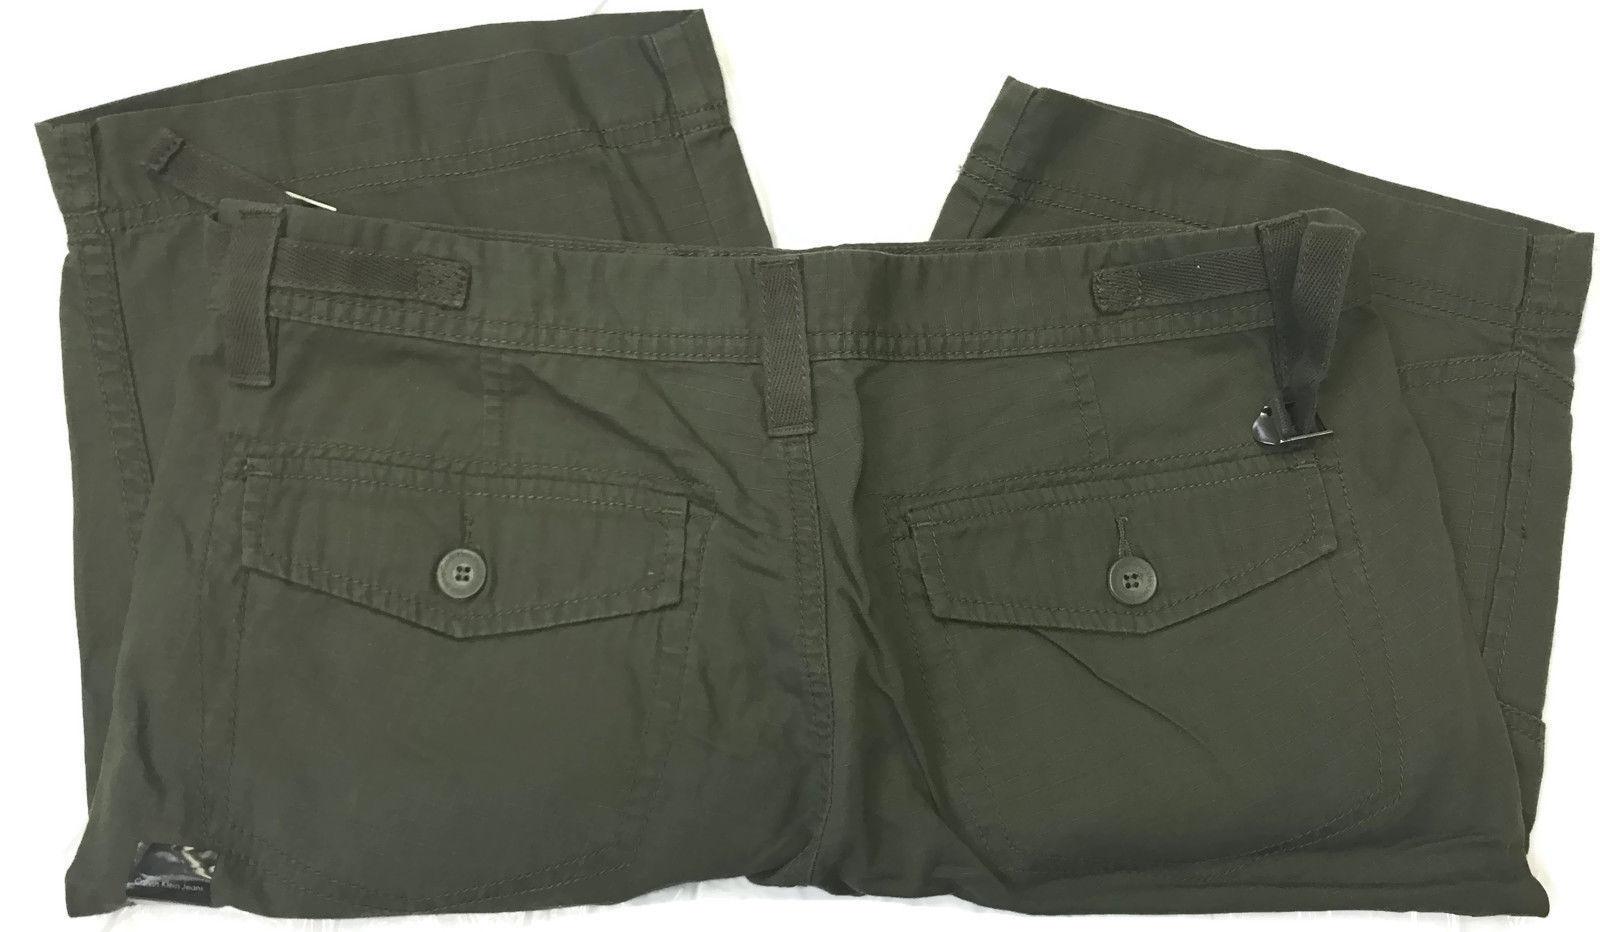 Calvin Klein Women's WB97C49 NWT Bermuda Shorts - Multiple Colors & Sizes